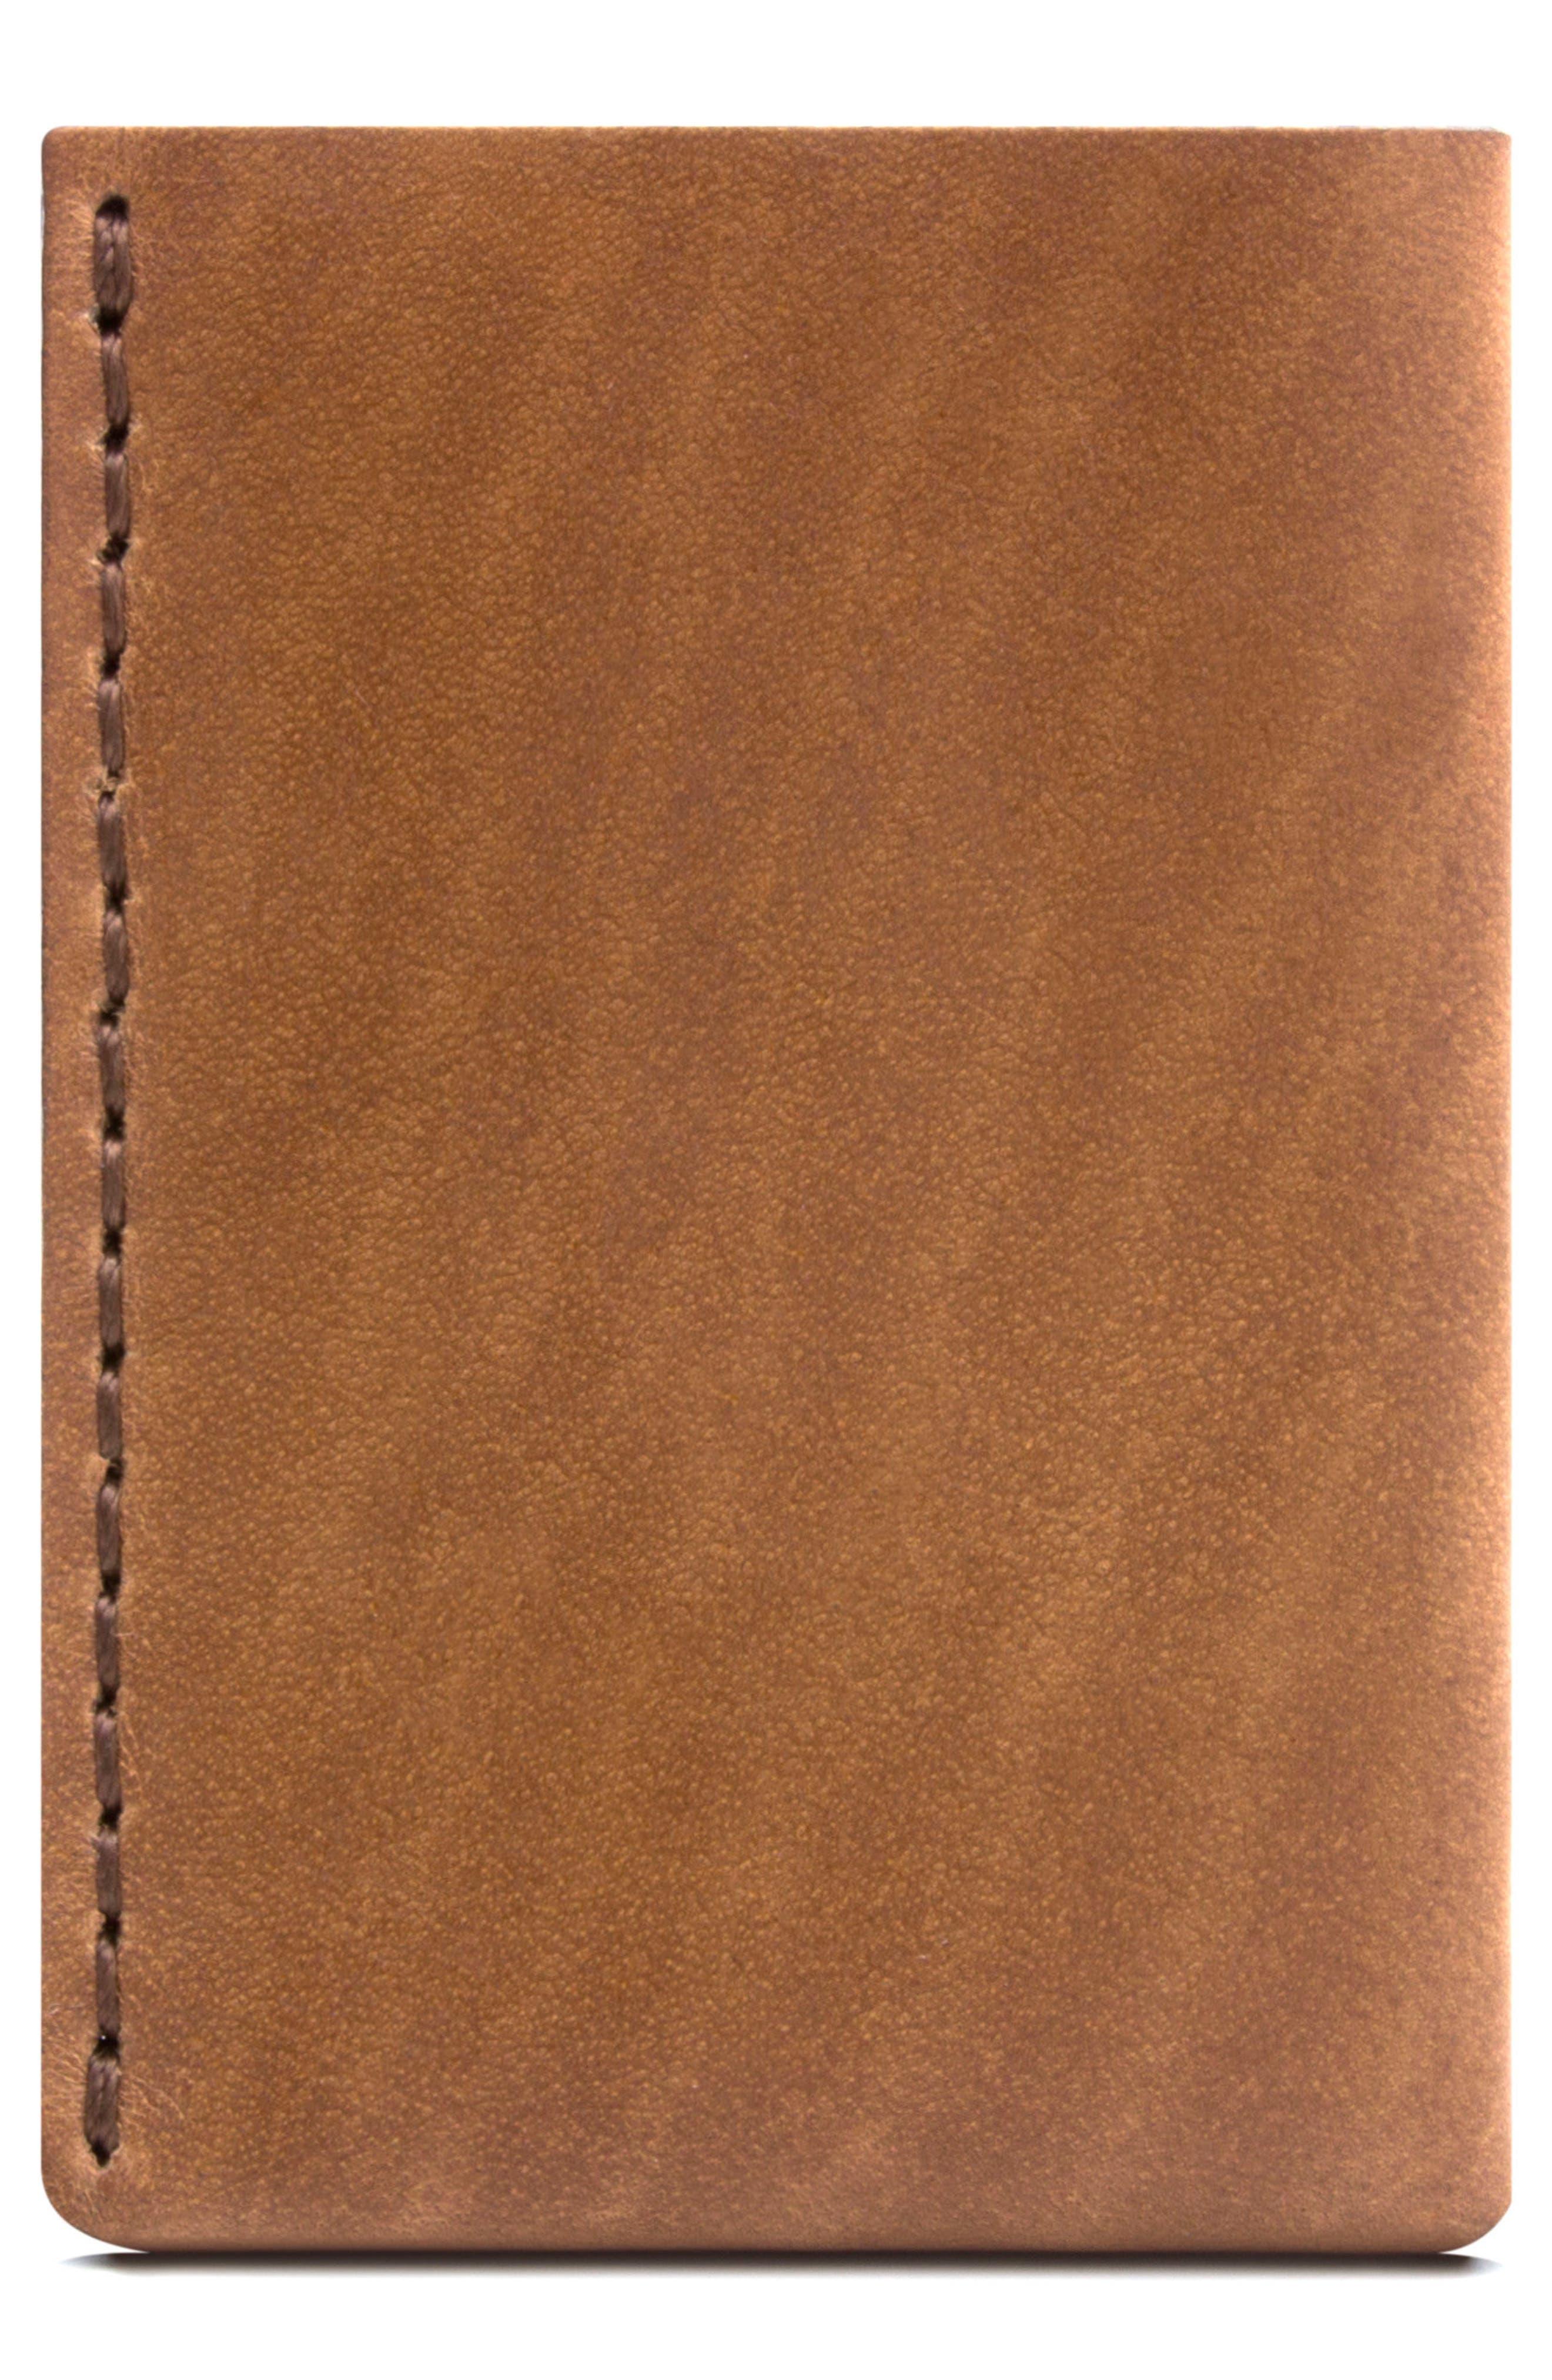 Ezra Arthur No. 7 Leather Wallet